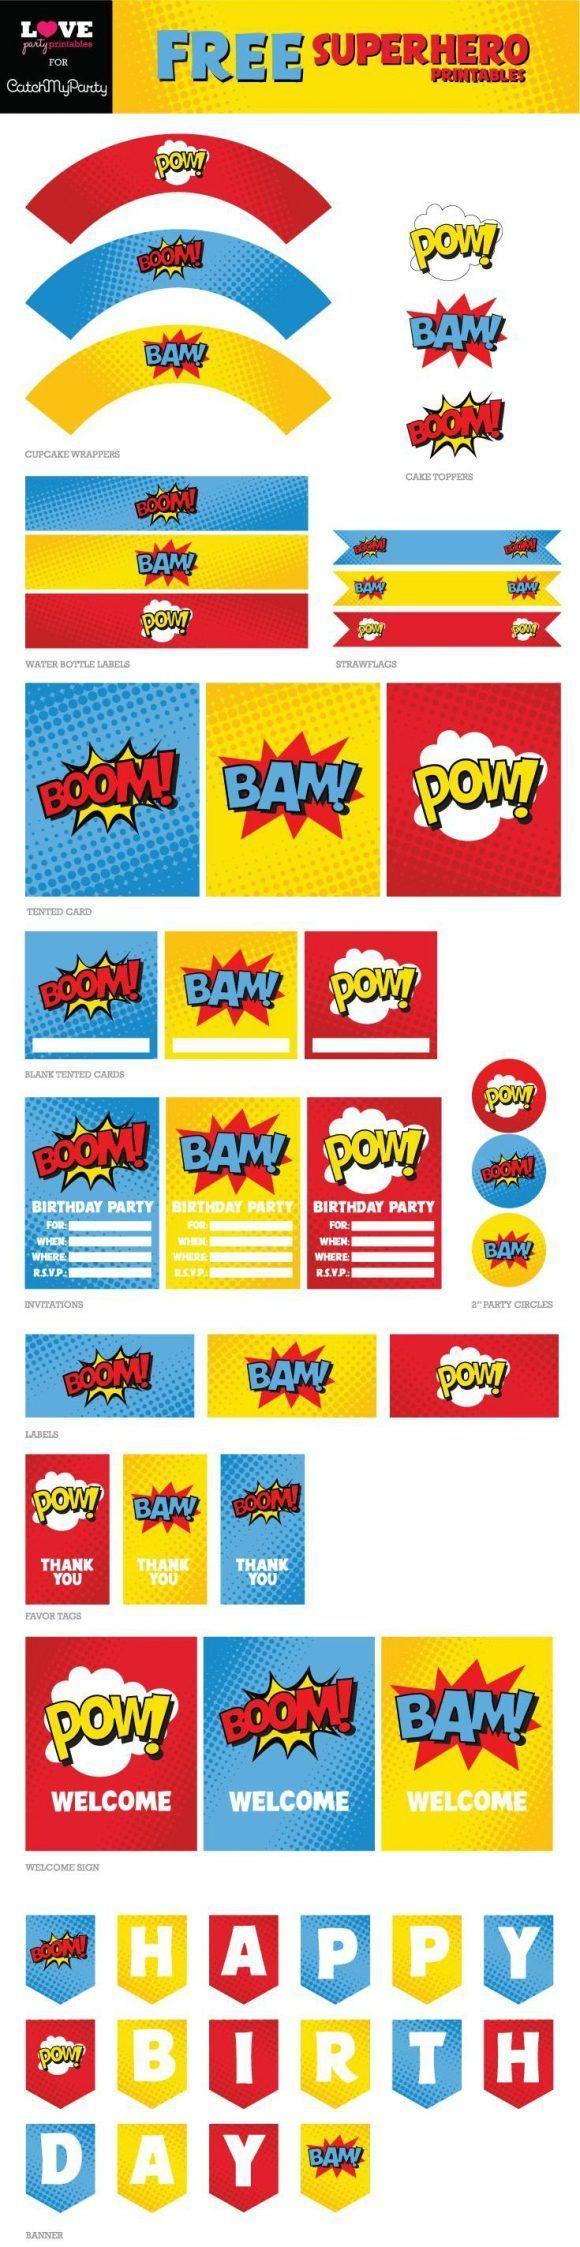 Free Superhero Party Printables Including Happy Birthday Banner